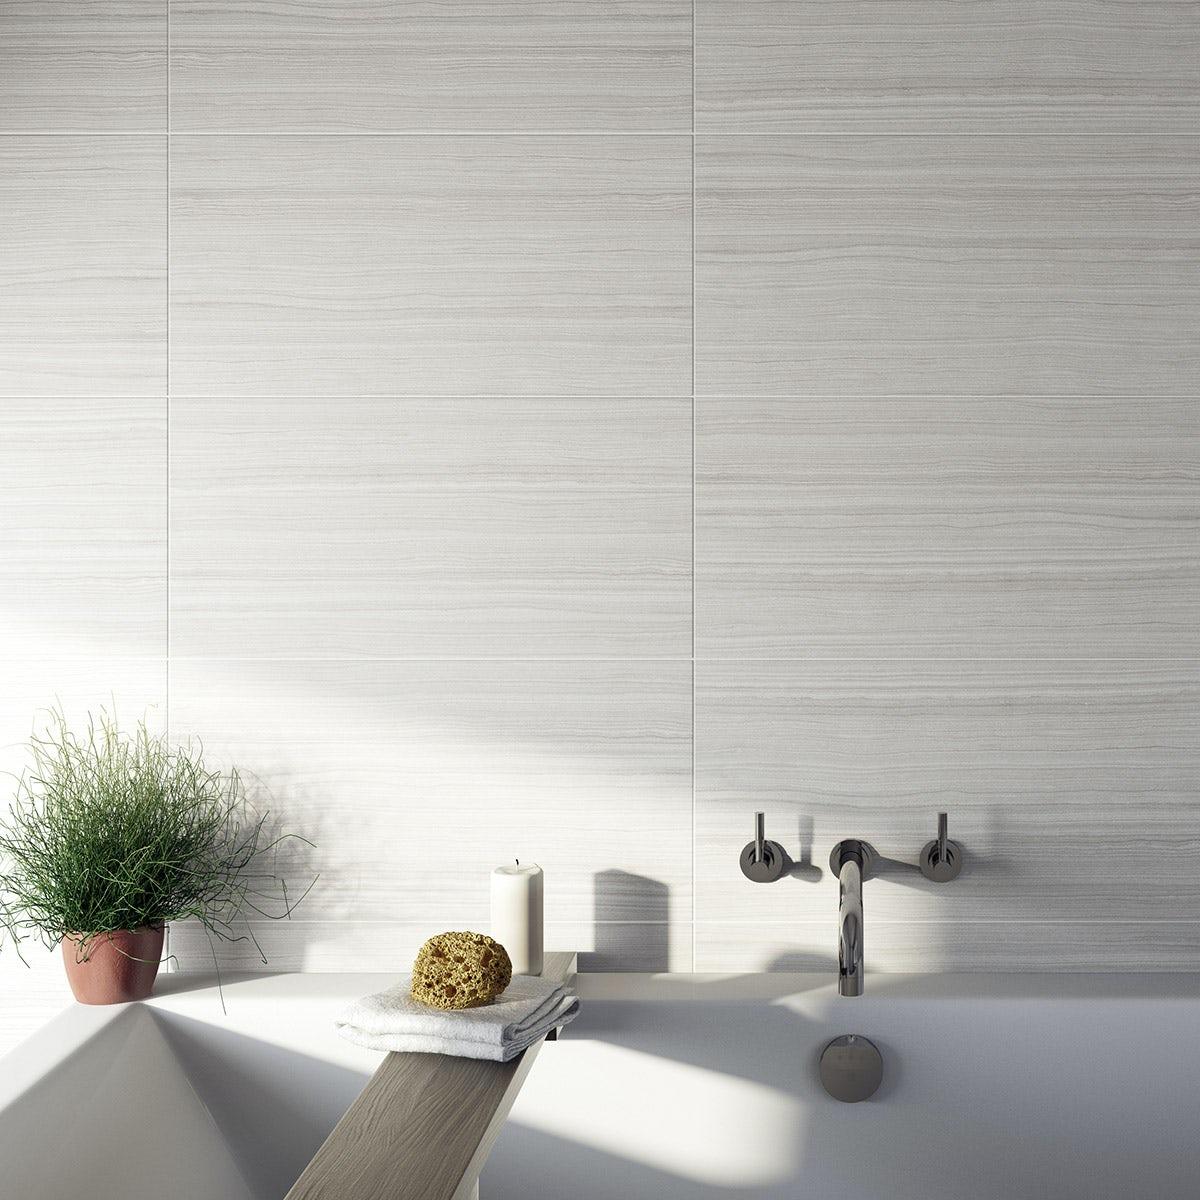 British Ceramic Tile Mirage grey gloss tile 298mm x 598mm